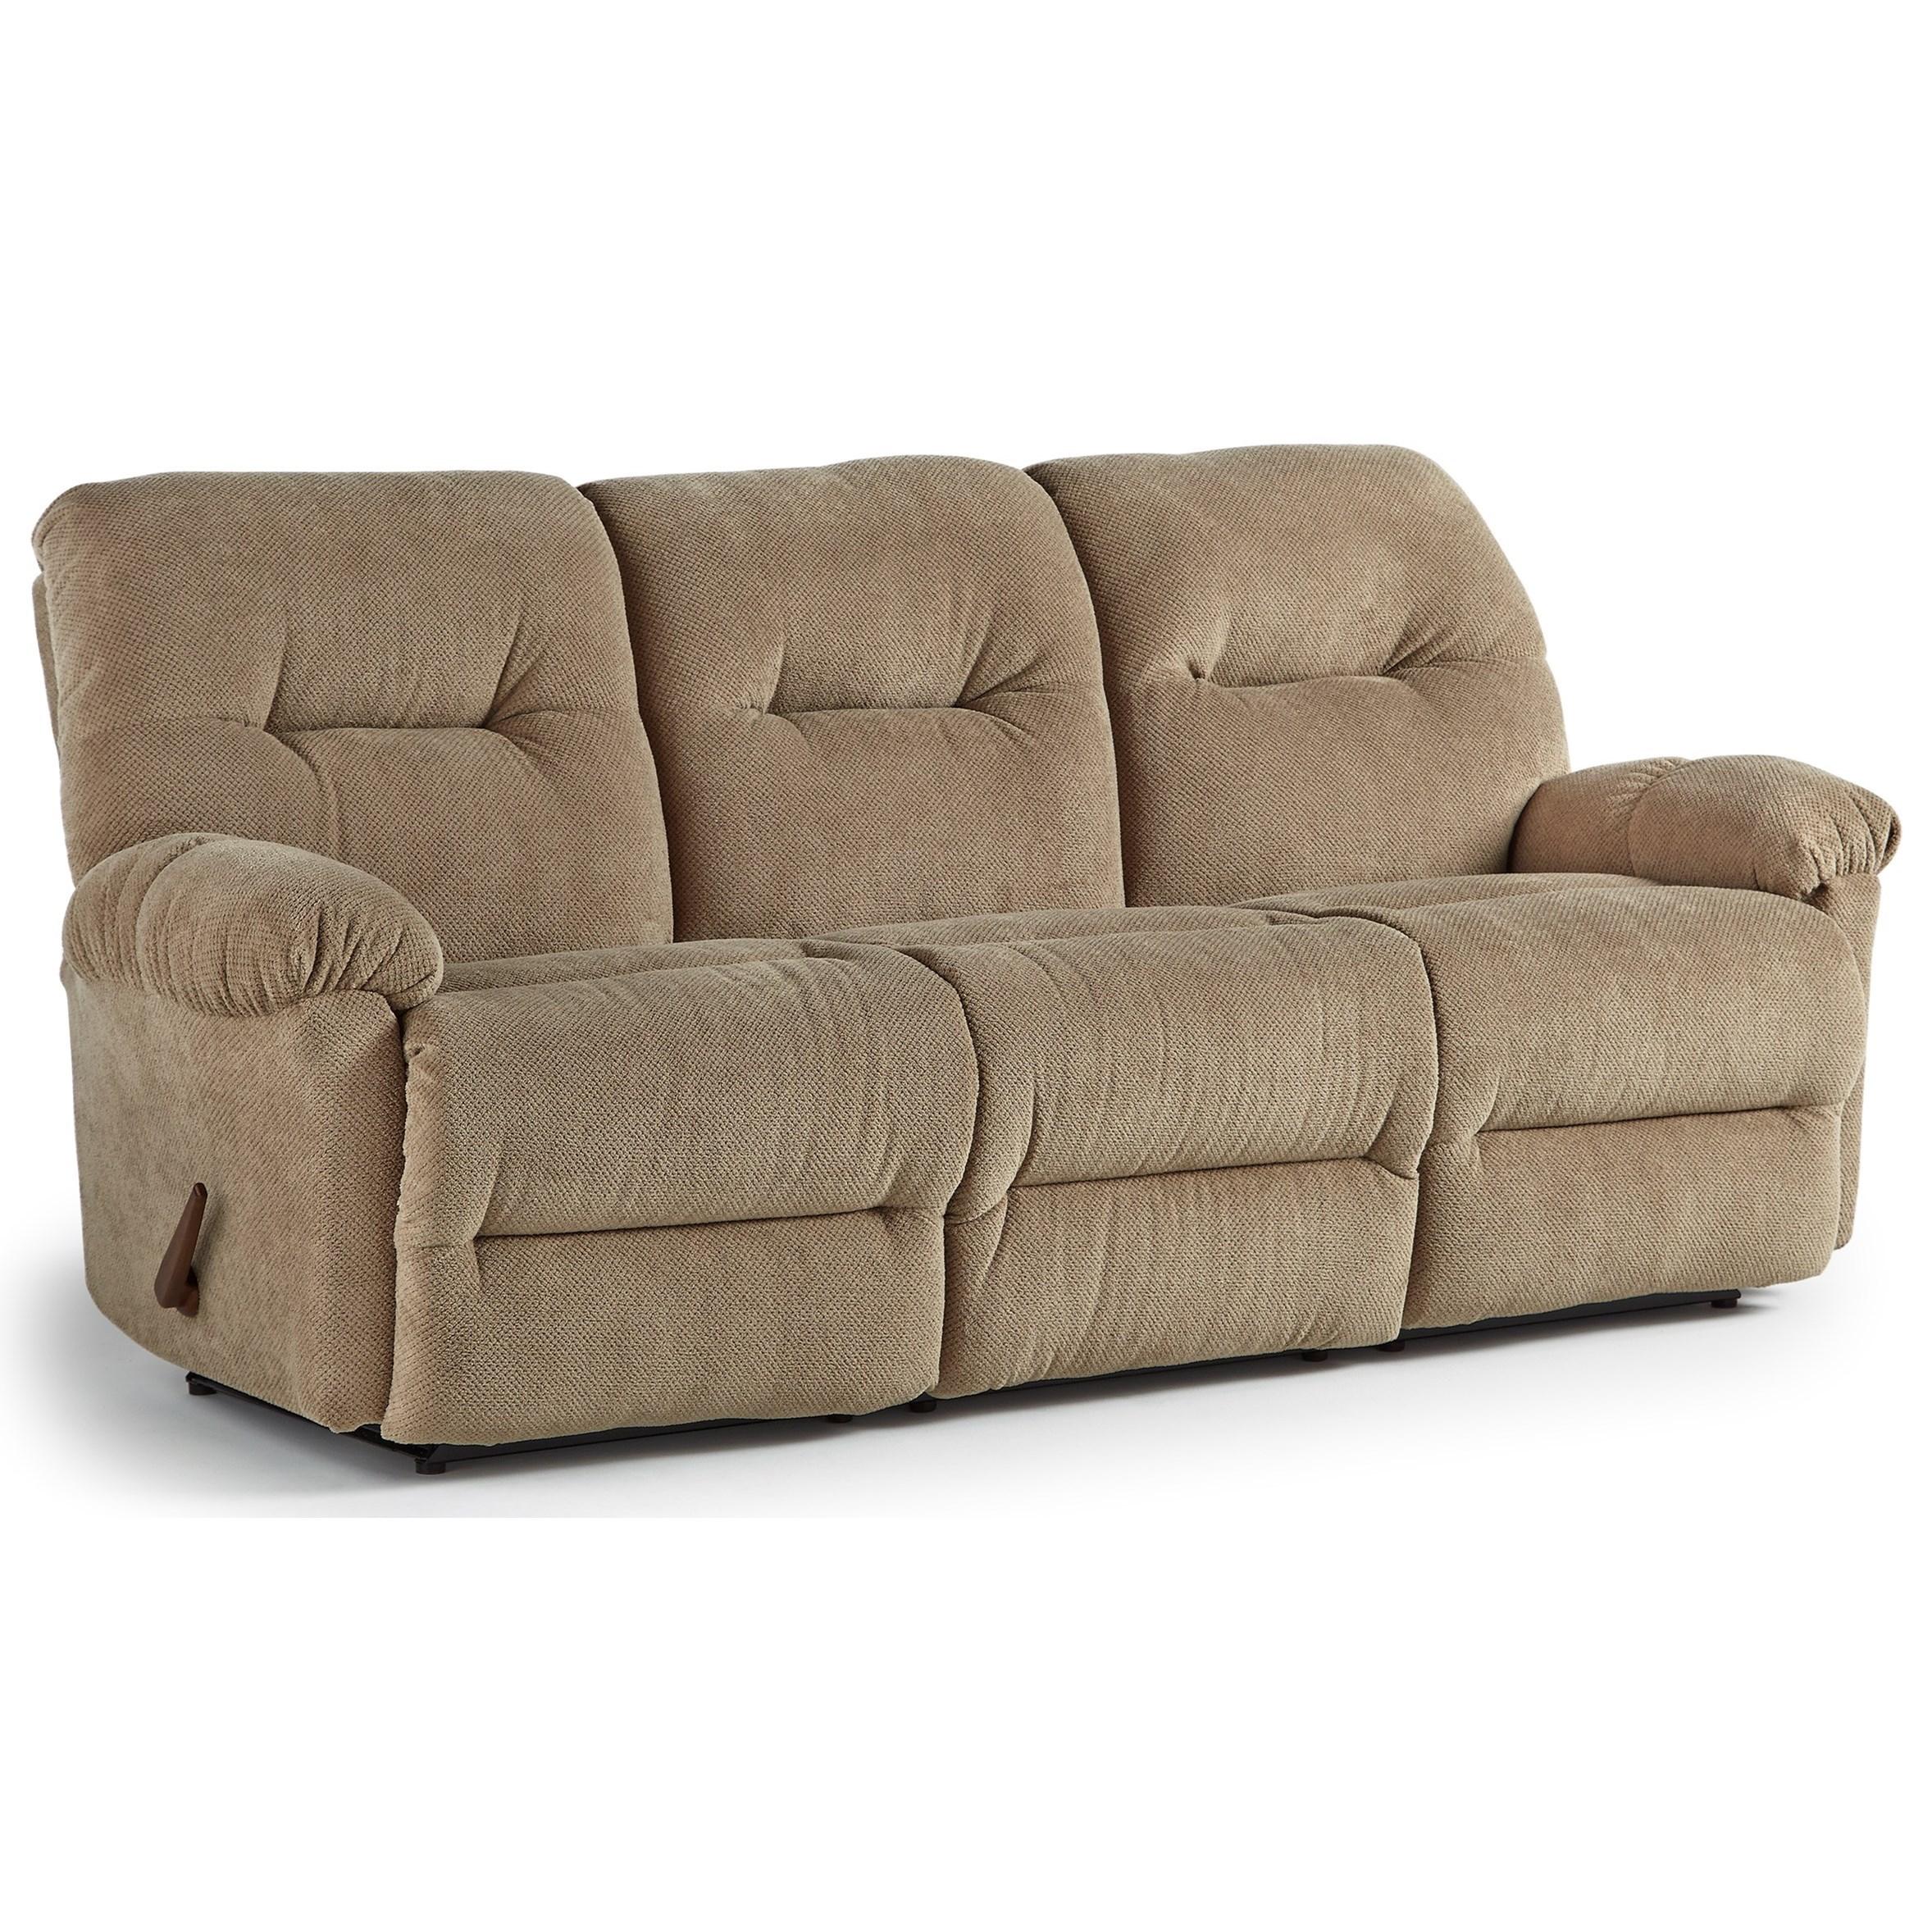 Best Home Furnishings Ellisport Ellisport Power Reclining Sofa - Item Number: S640RP4